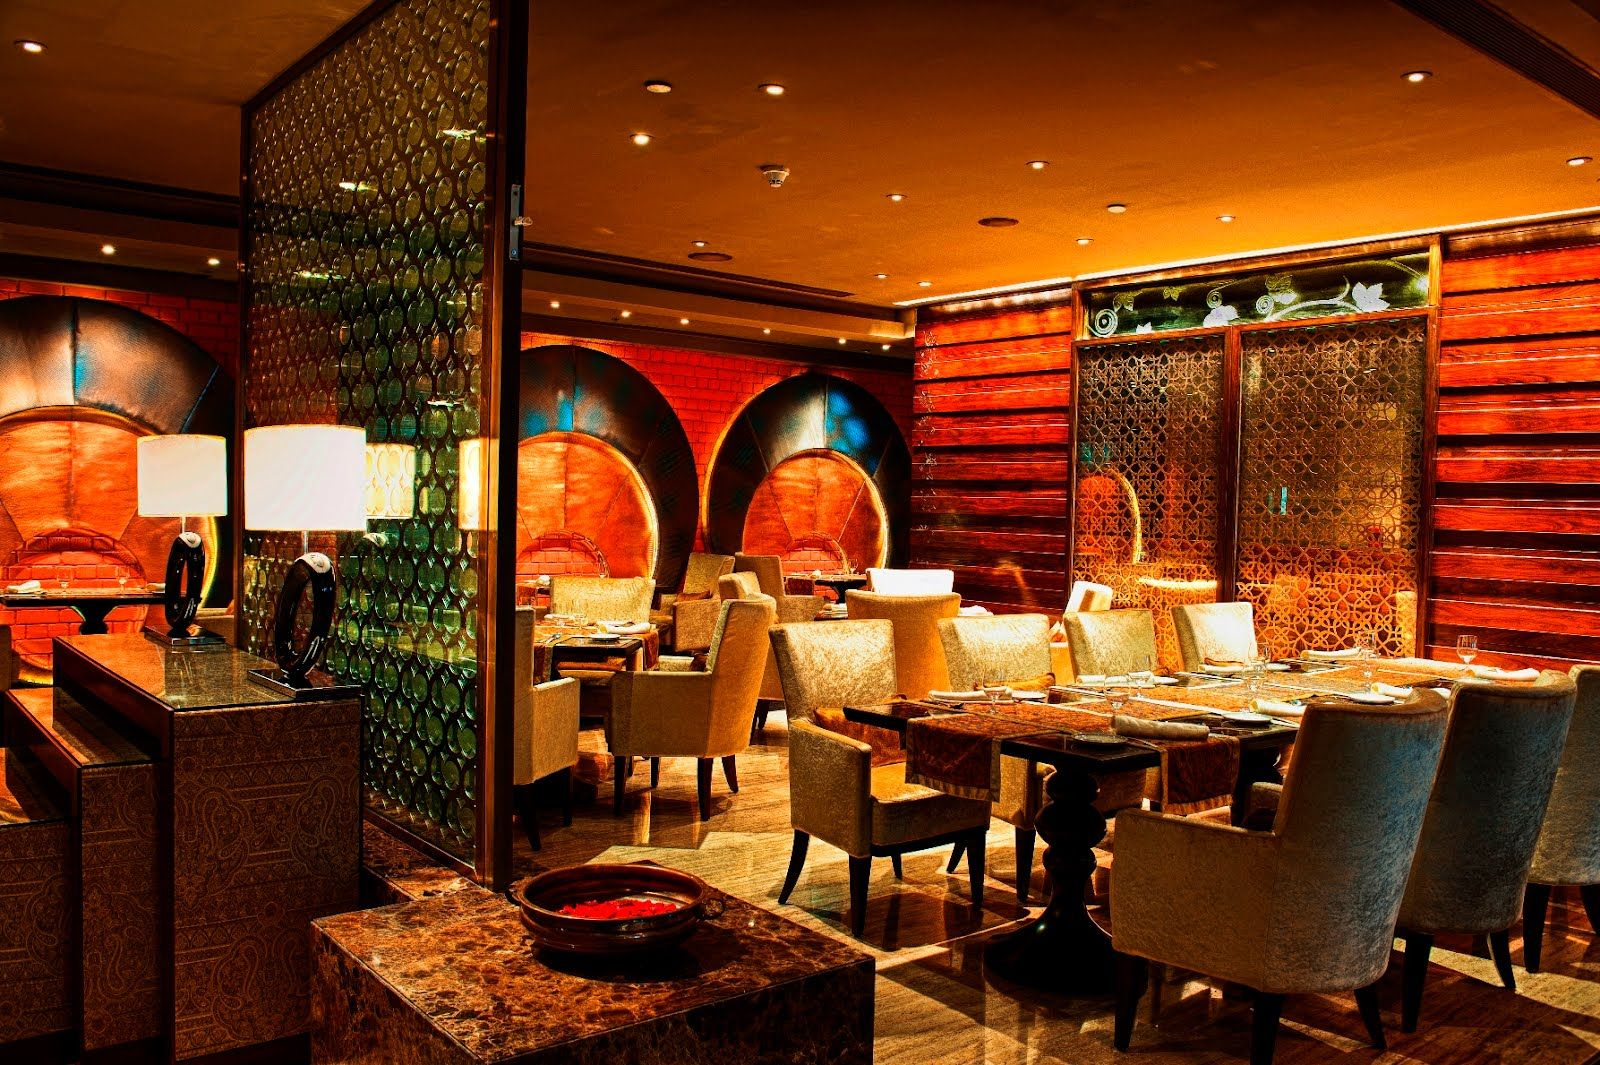 Indian restaurants interior design indian restaurants  india inspired design  pinterest  restaurants